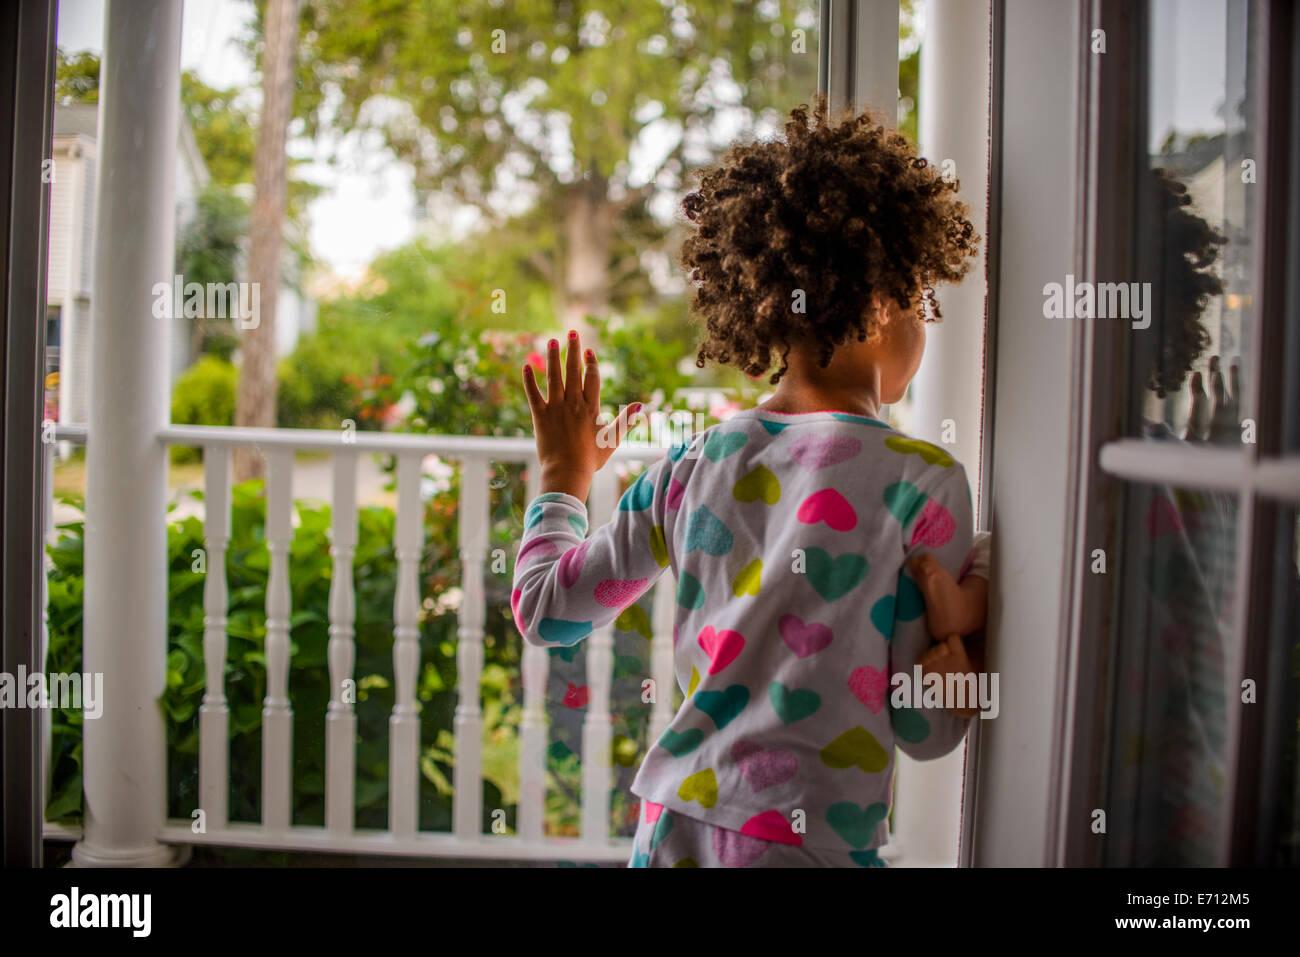 7b3051318 Sliding Door Stock Photos   Sliding Door Stock Images - Alamy